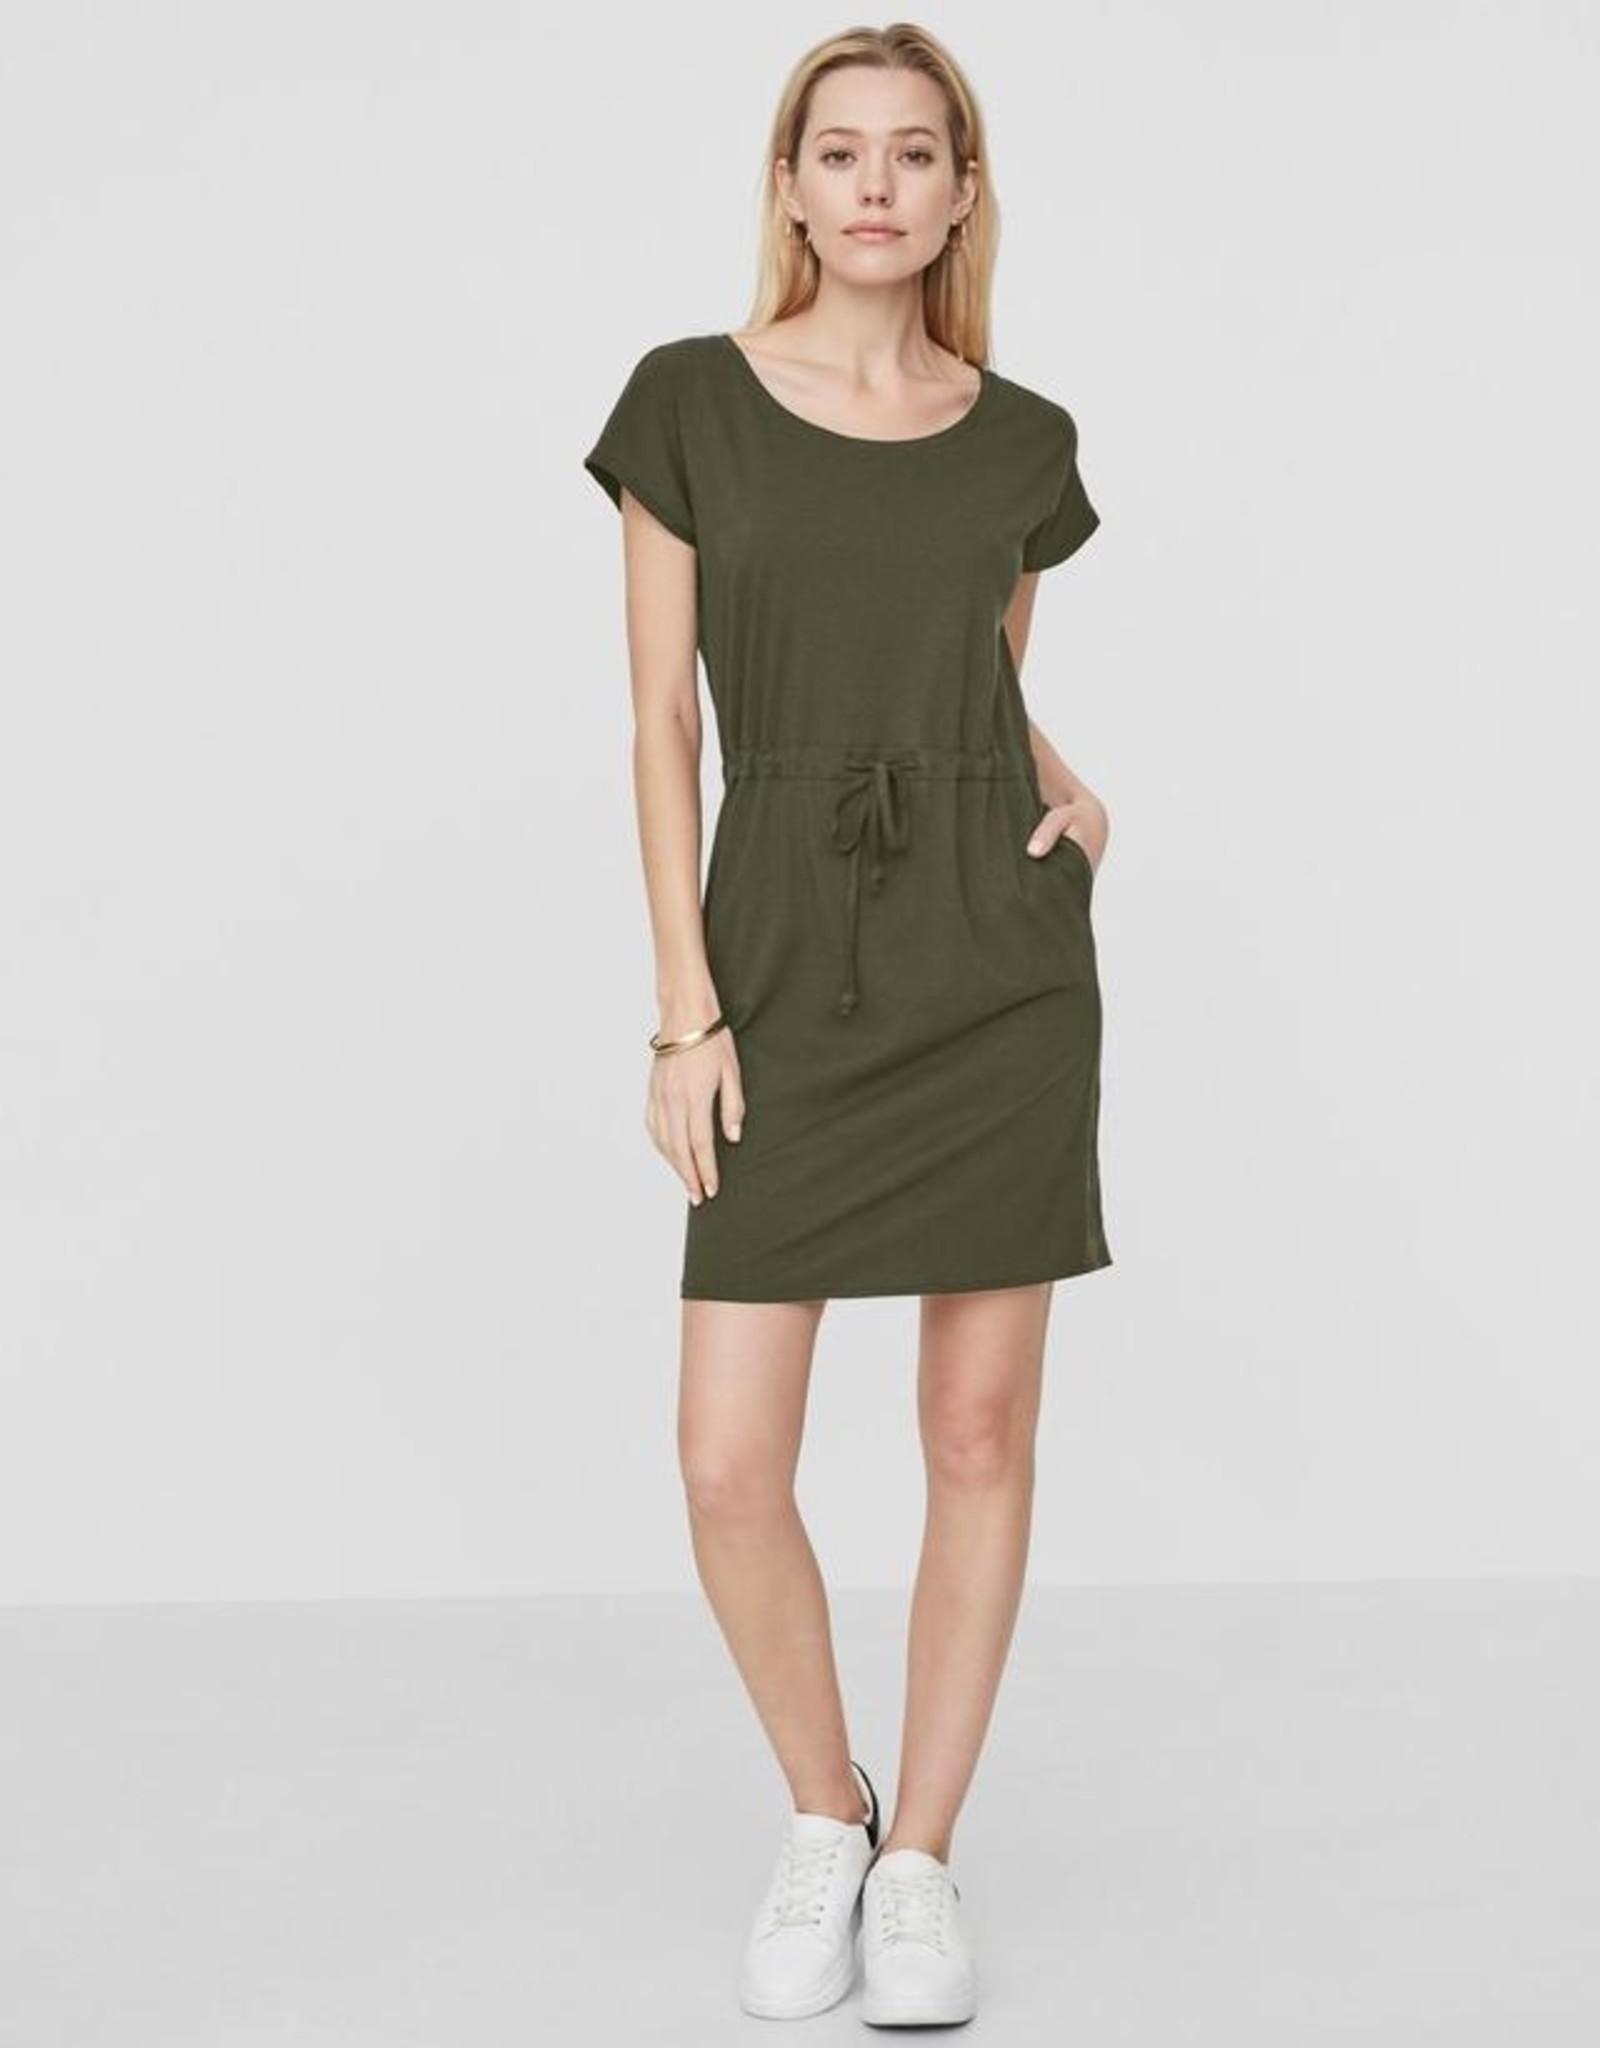 Vero Moda April Short Dress